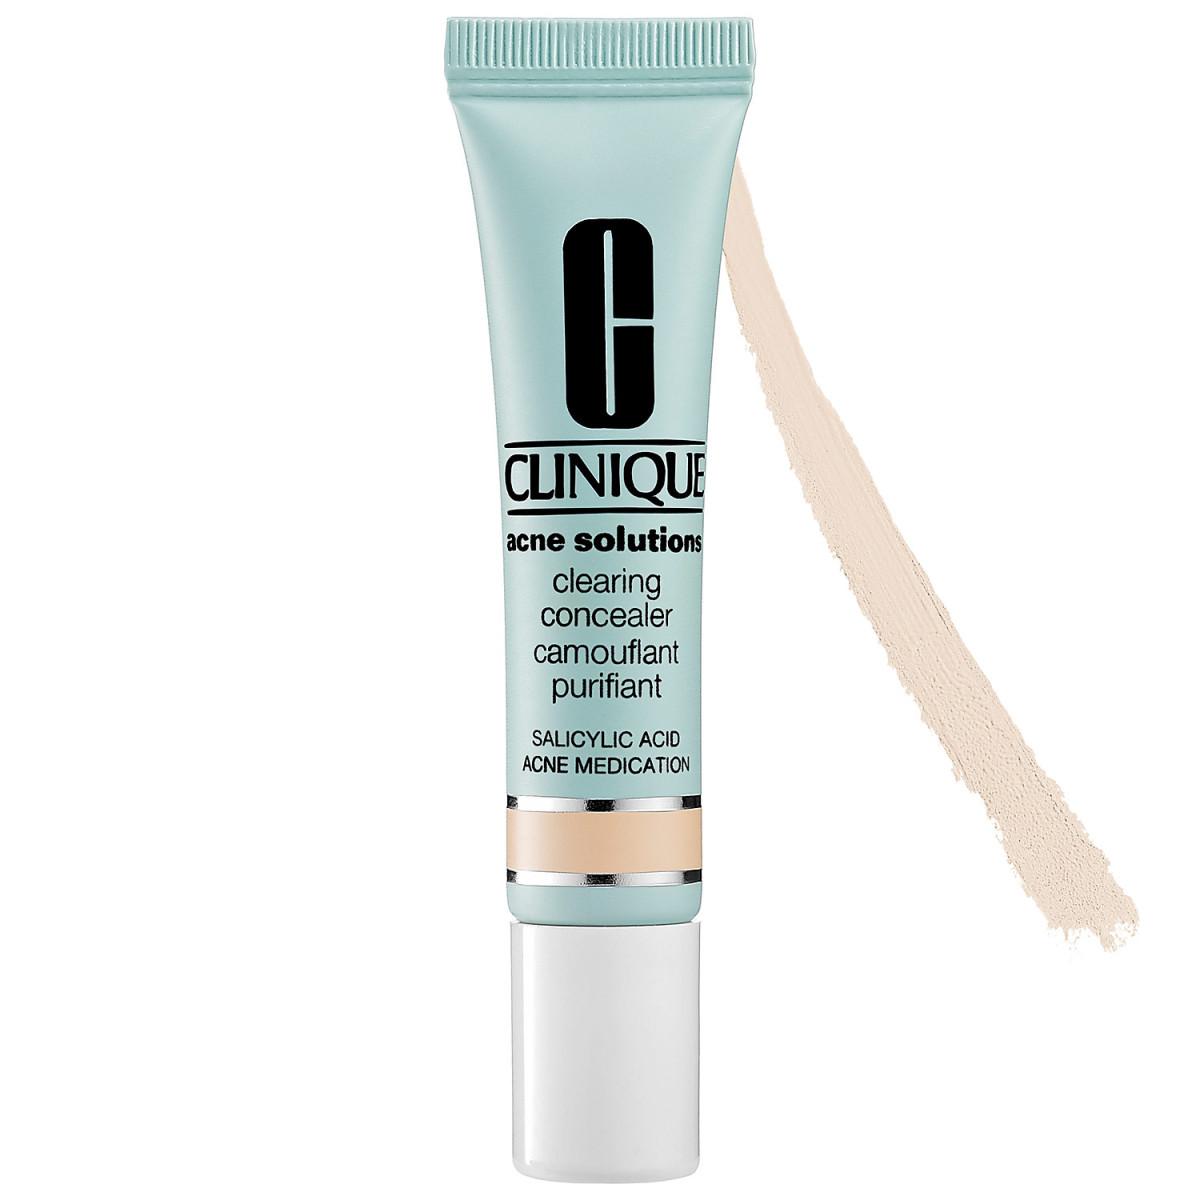 Clinique Acne Solutions (Image: Sephora)